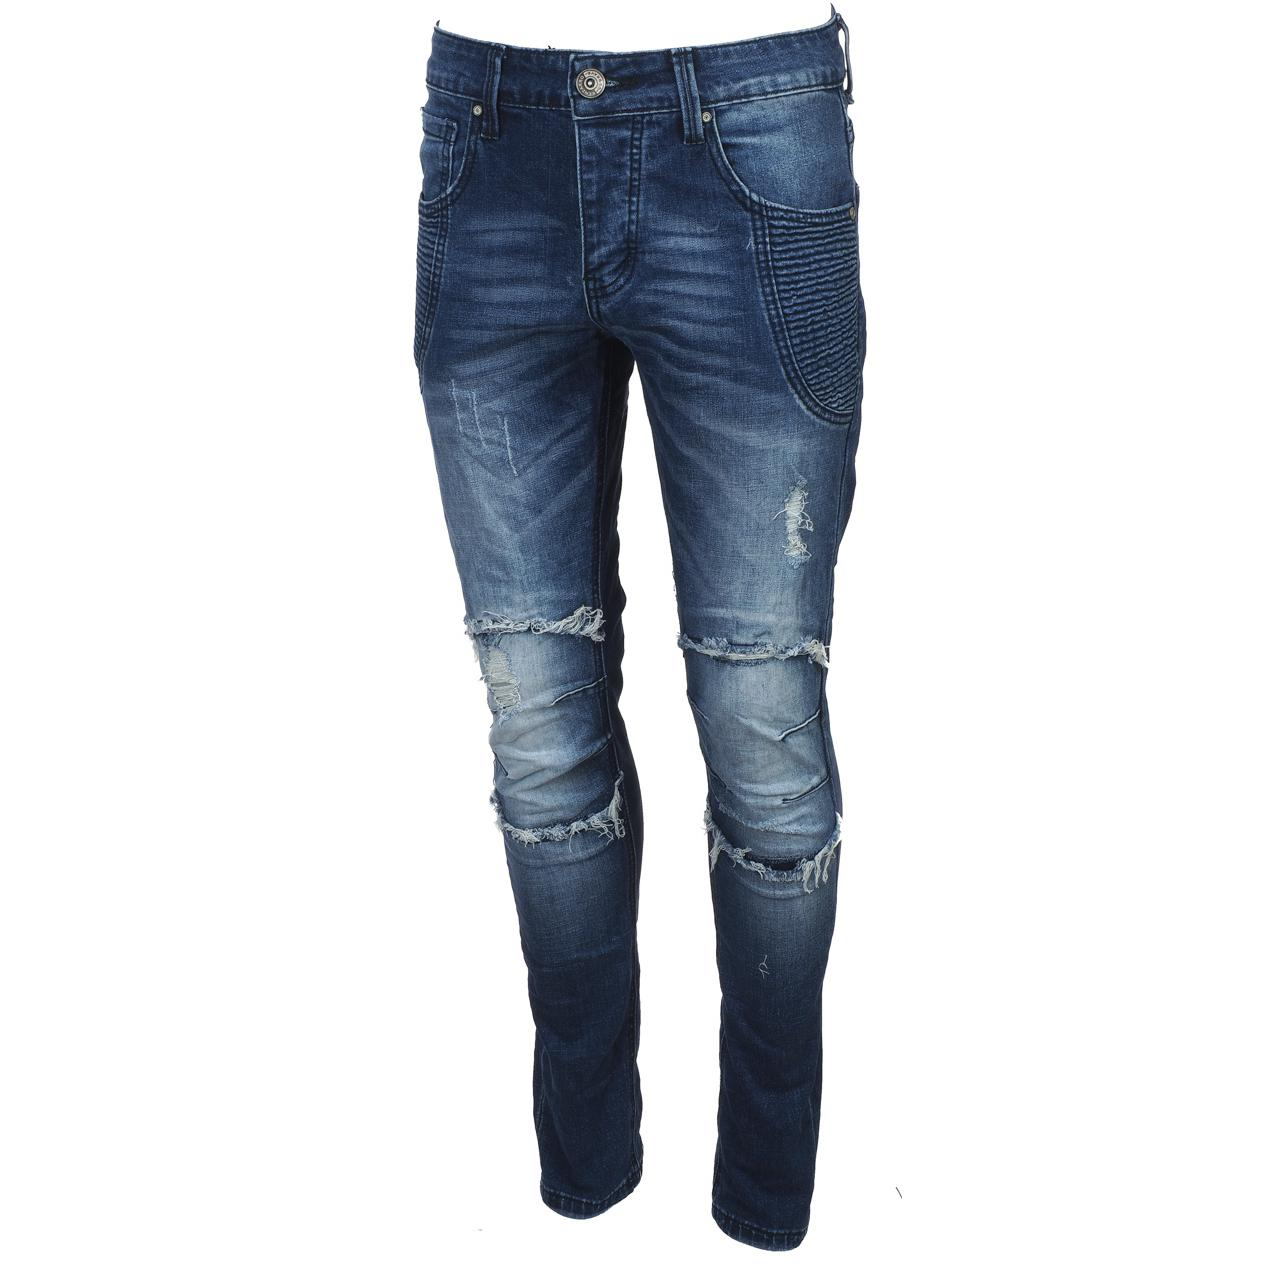 Jeans-Pants-Senders-Angeles-Used-Blue-H-Blue-39982-New